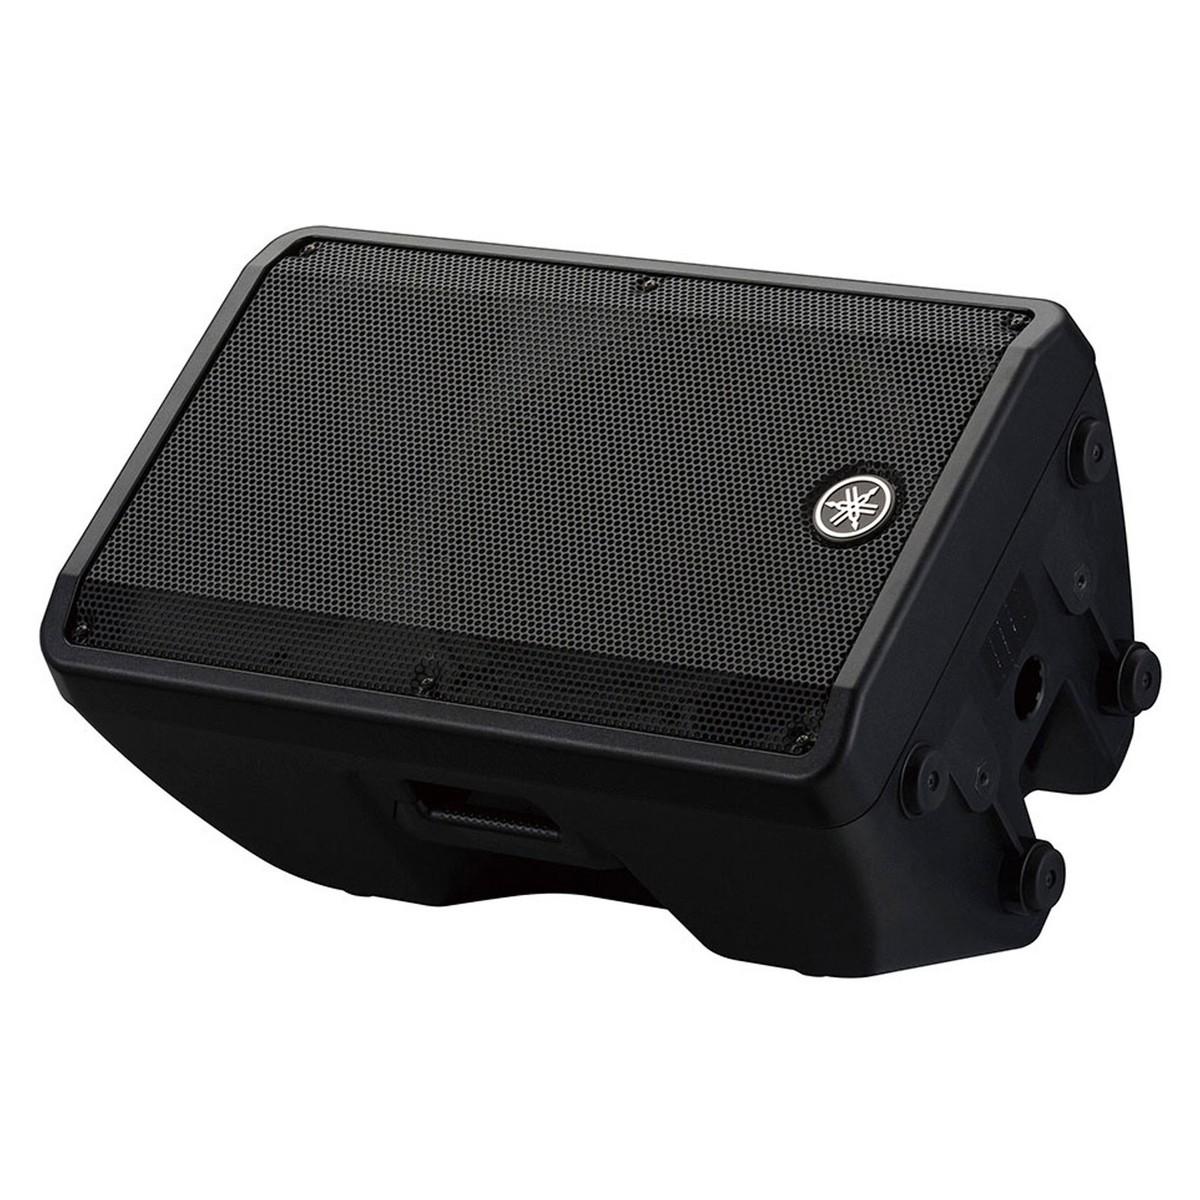 Yamaha dbr12 active pa speaker pair with speaker stands at for Yamaha dj speaker